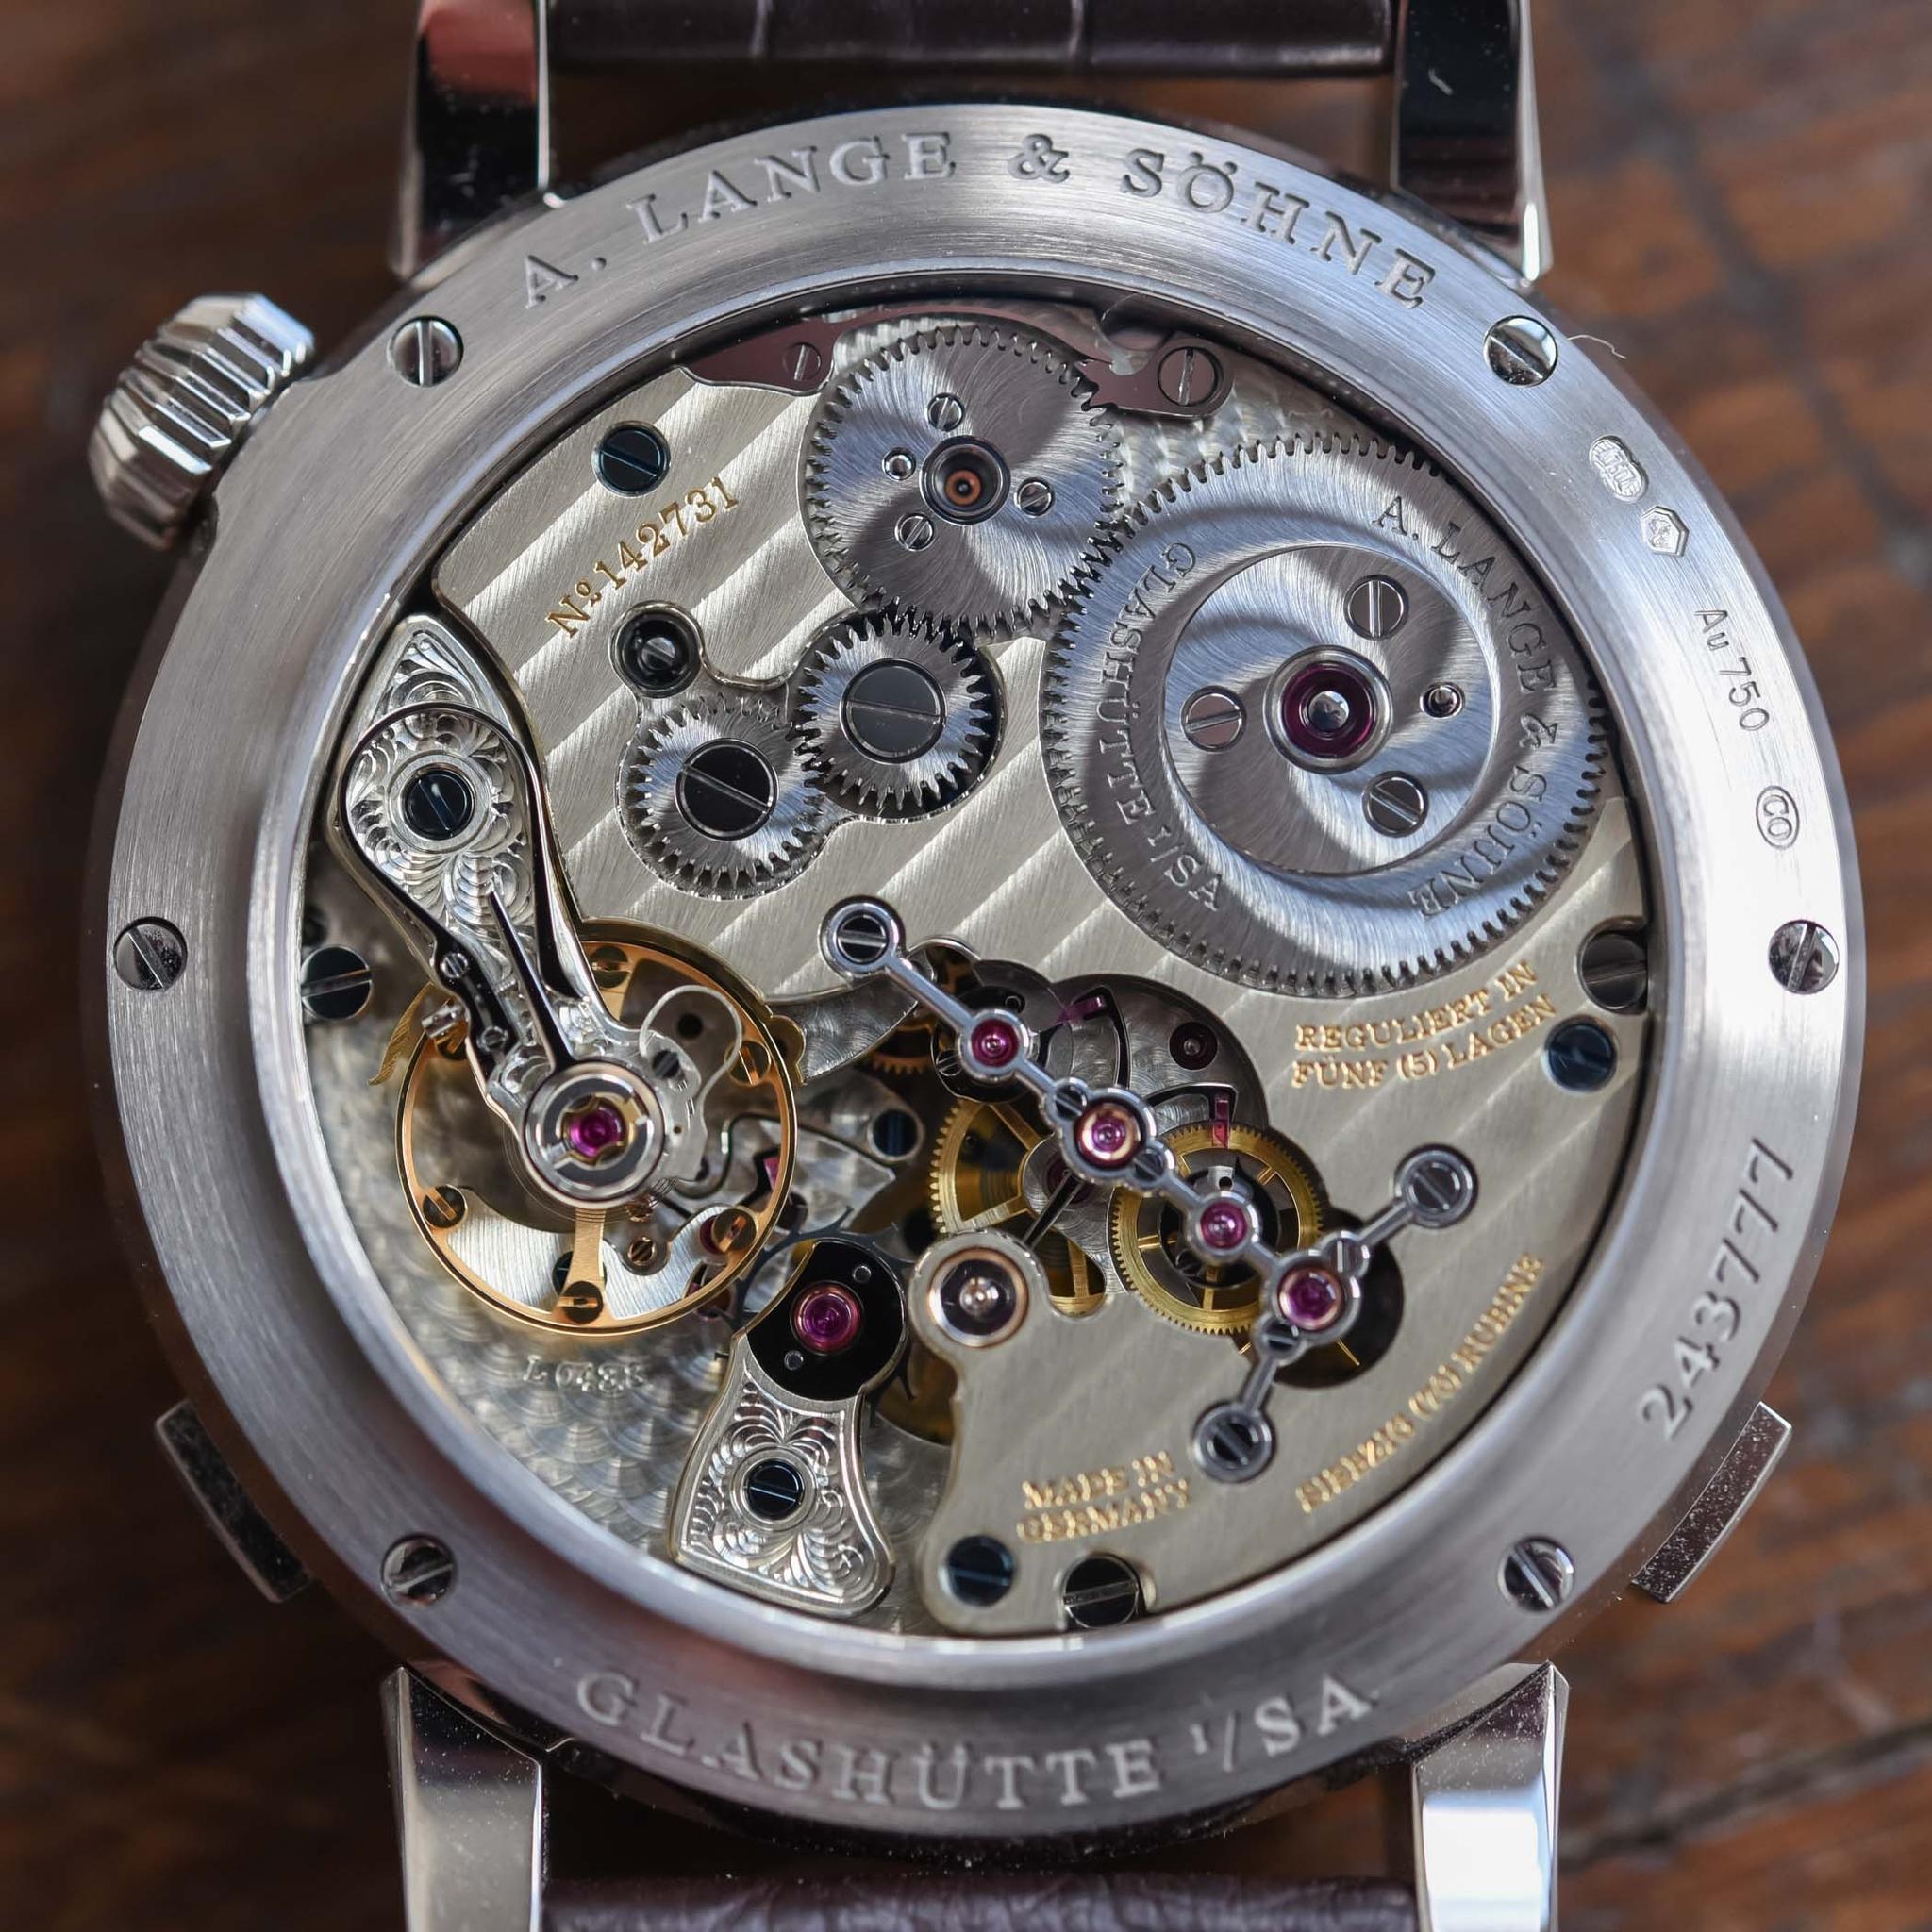 Bộ máy đồng hồ Đồng hồ A Lange Sohne Zeitwerk Date